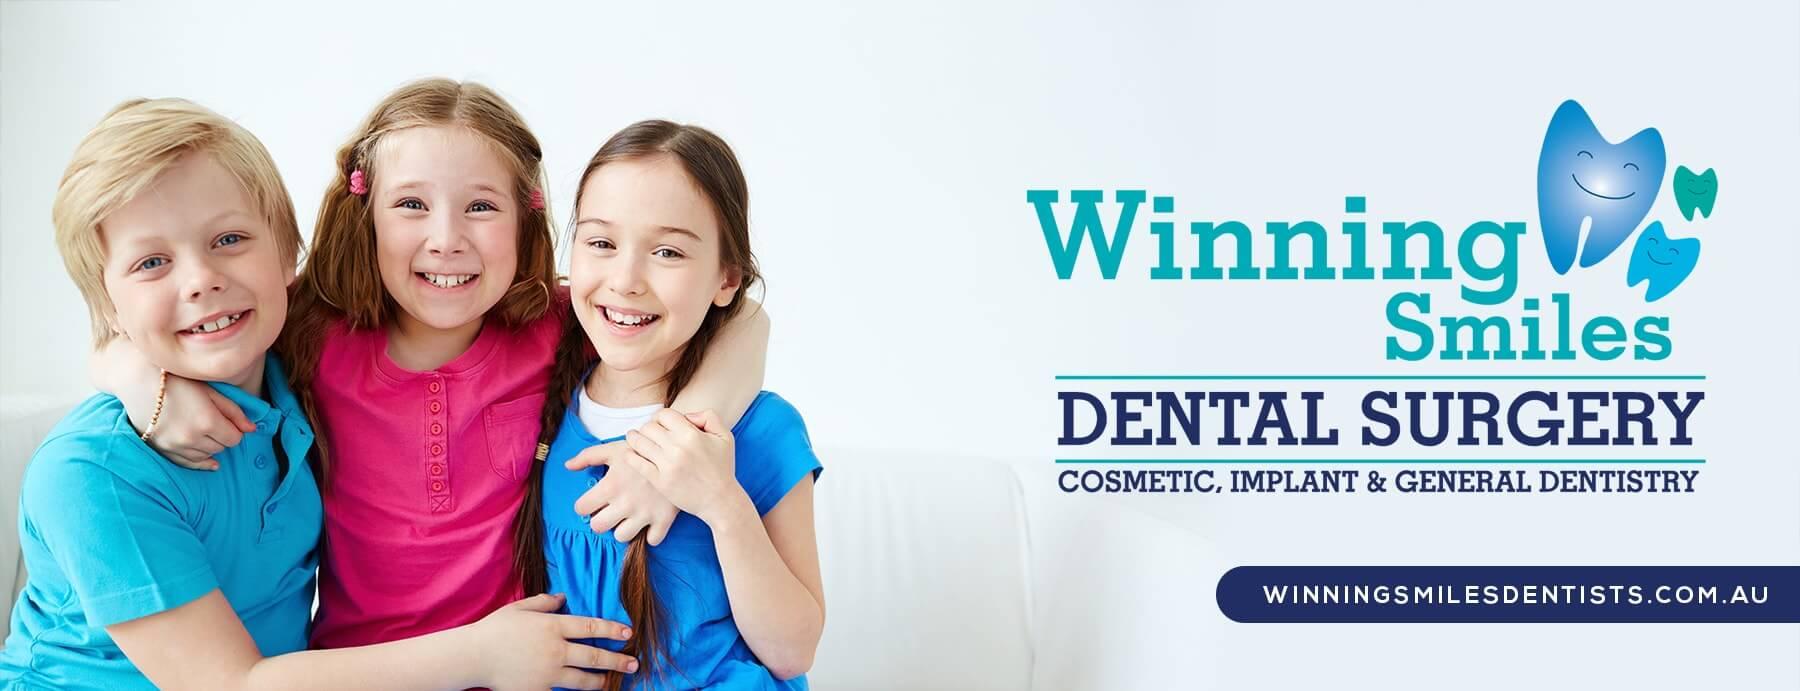 Winning Smile Dentists